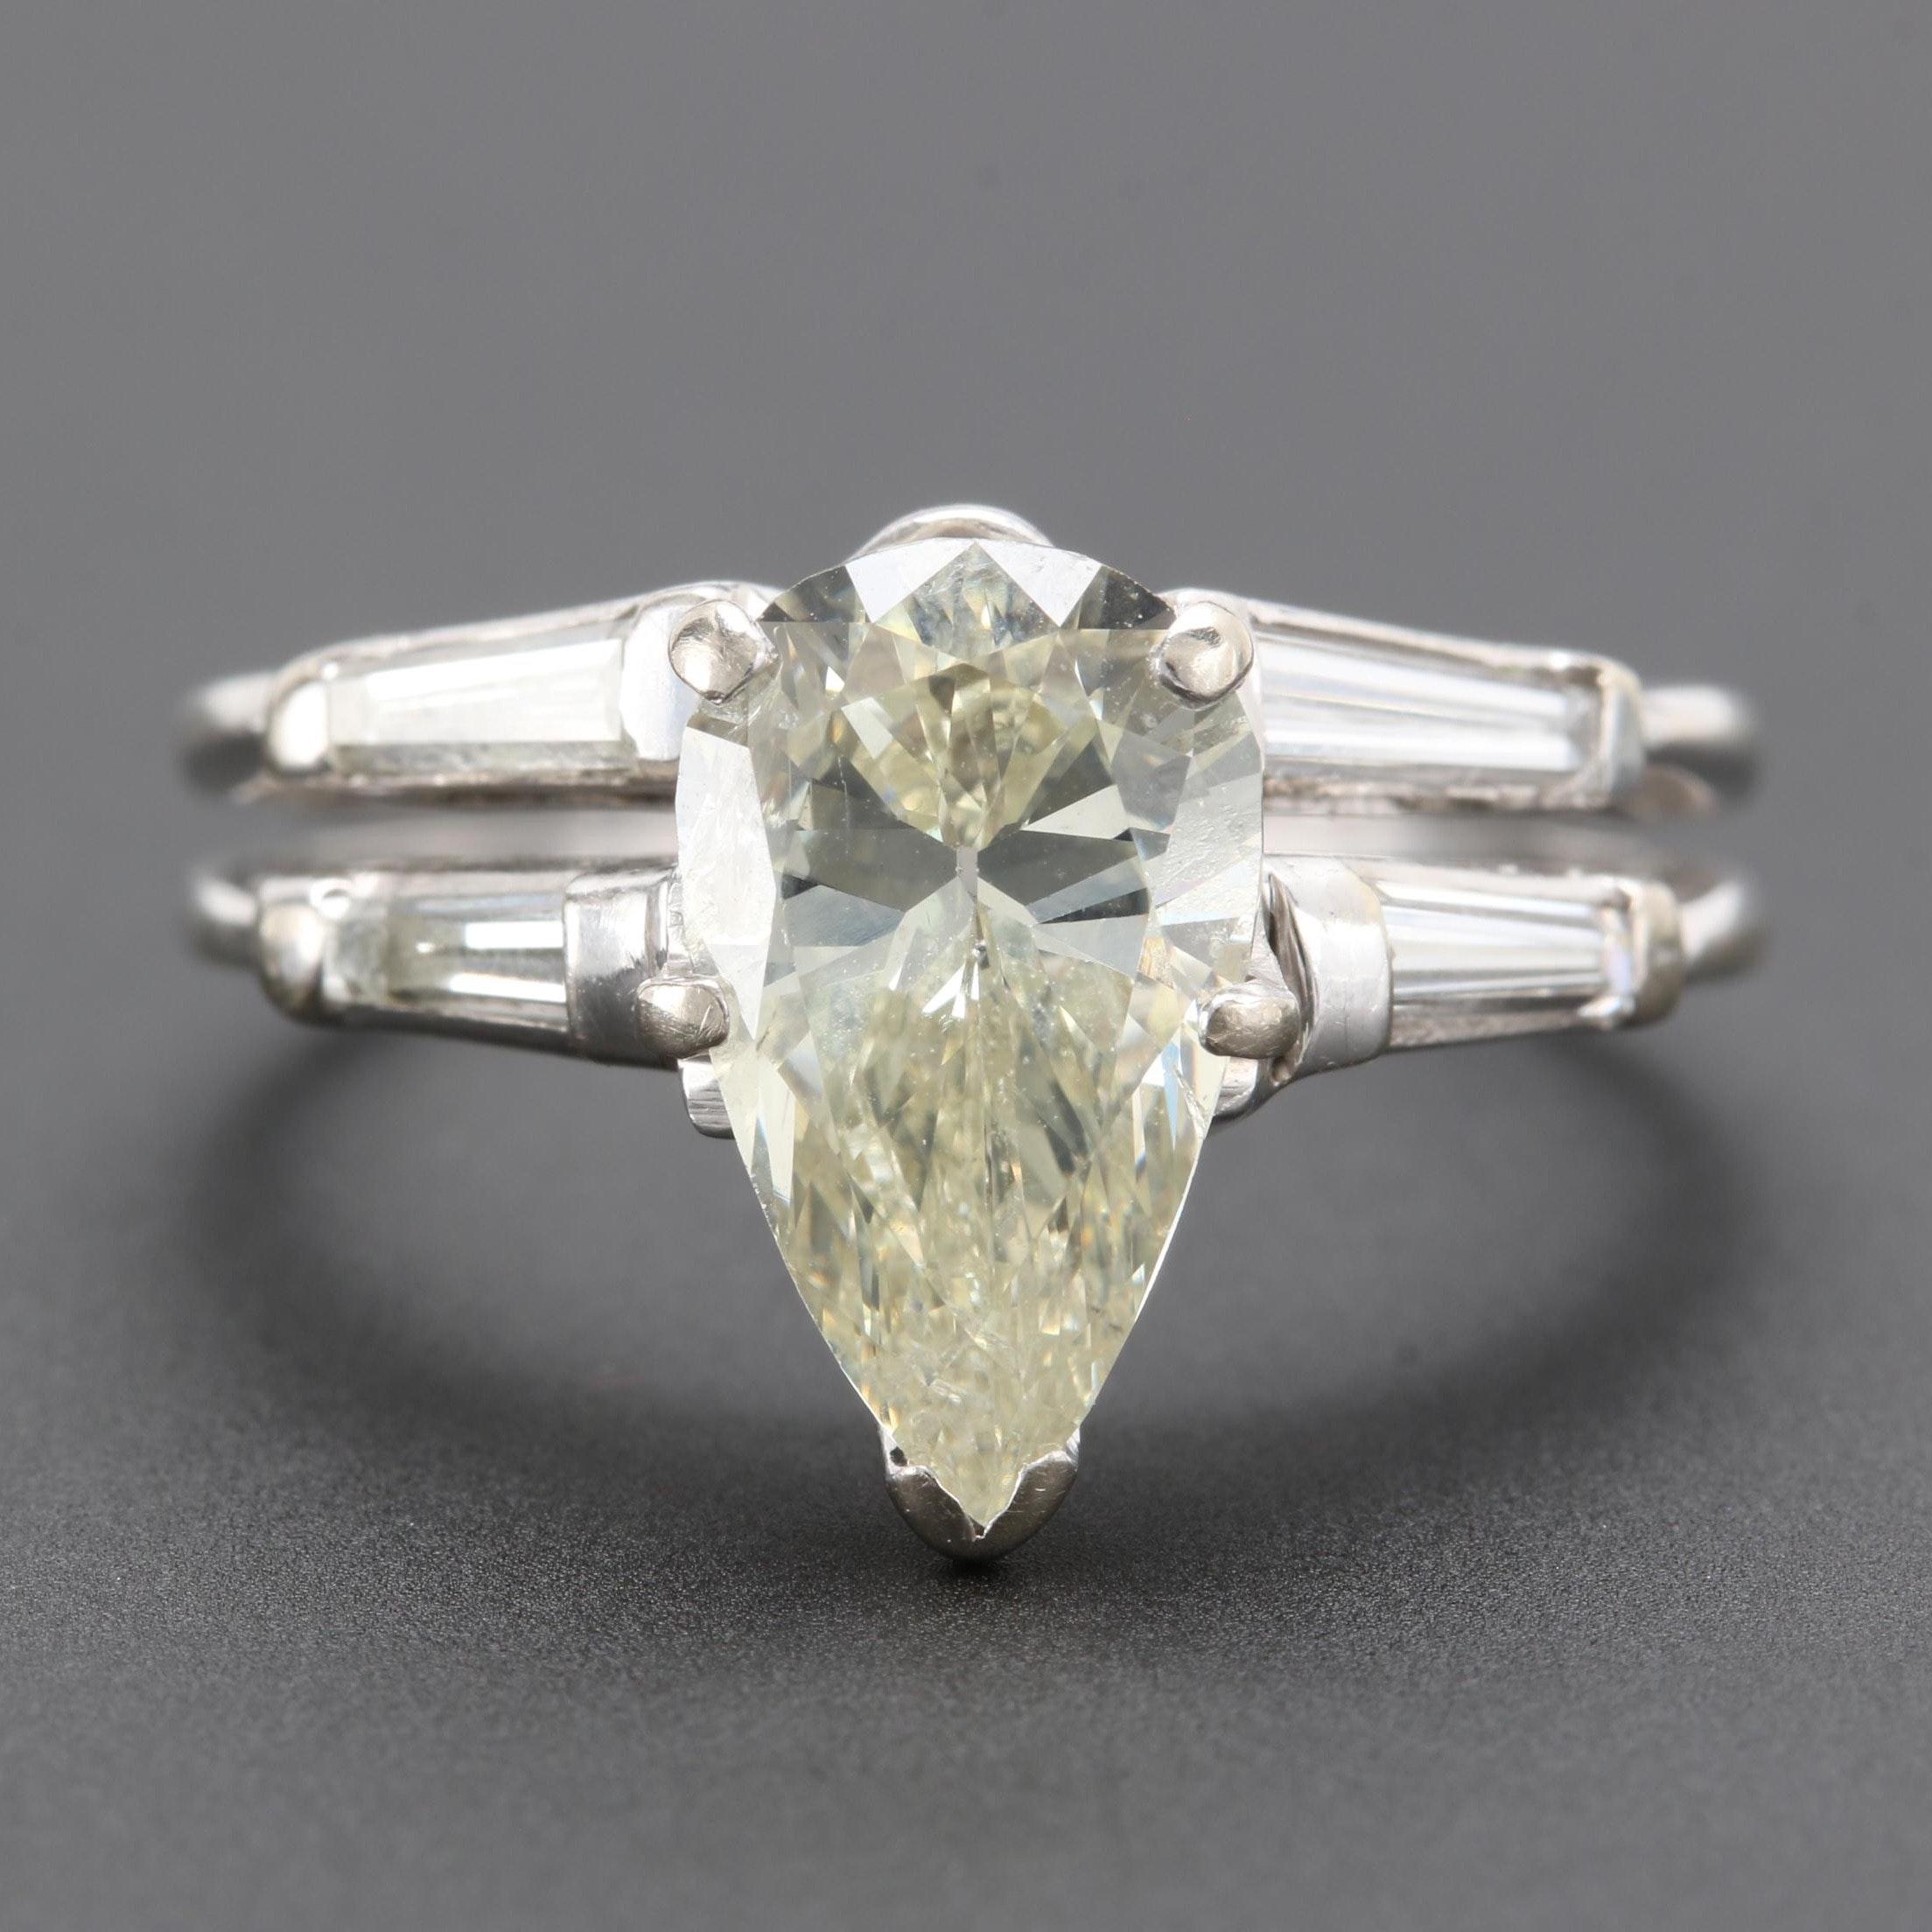 14K White Gold 2.55 CTW Diamond Ring